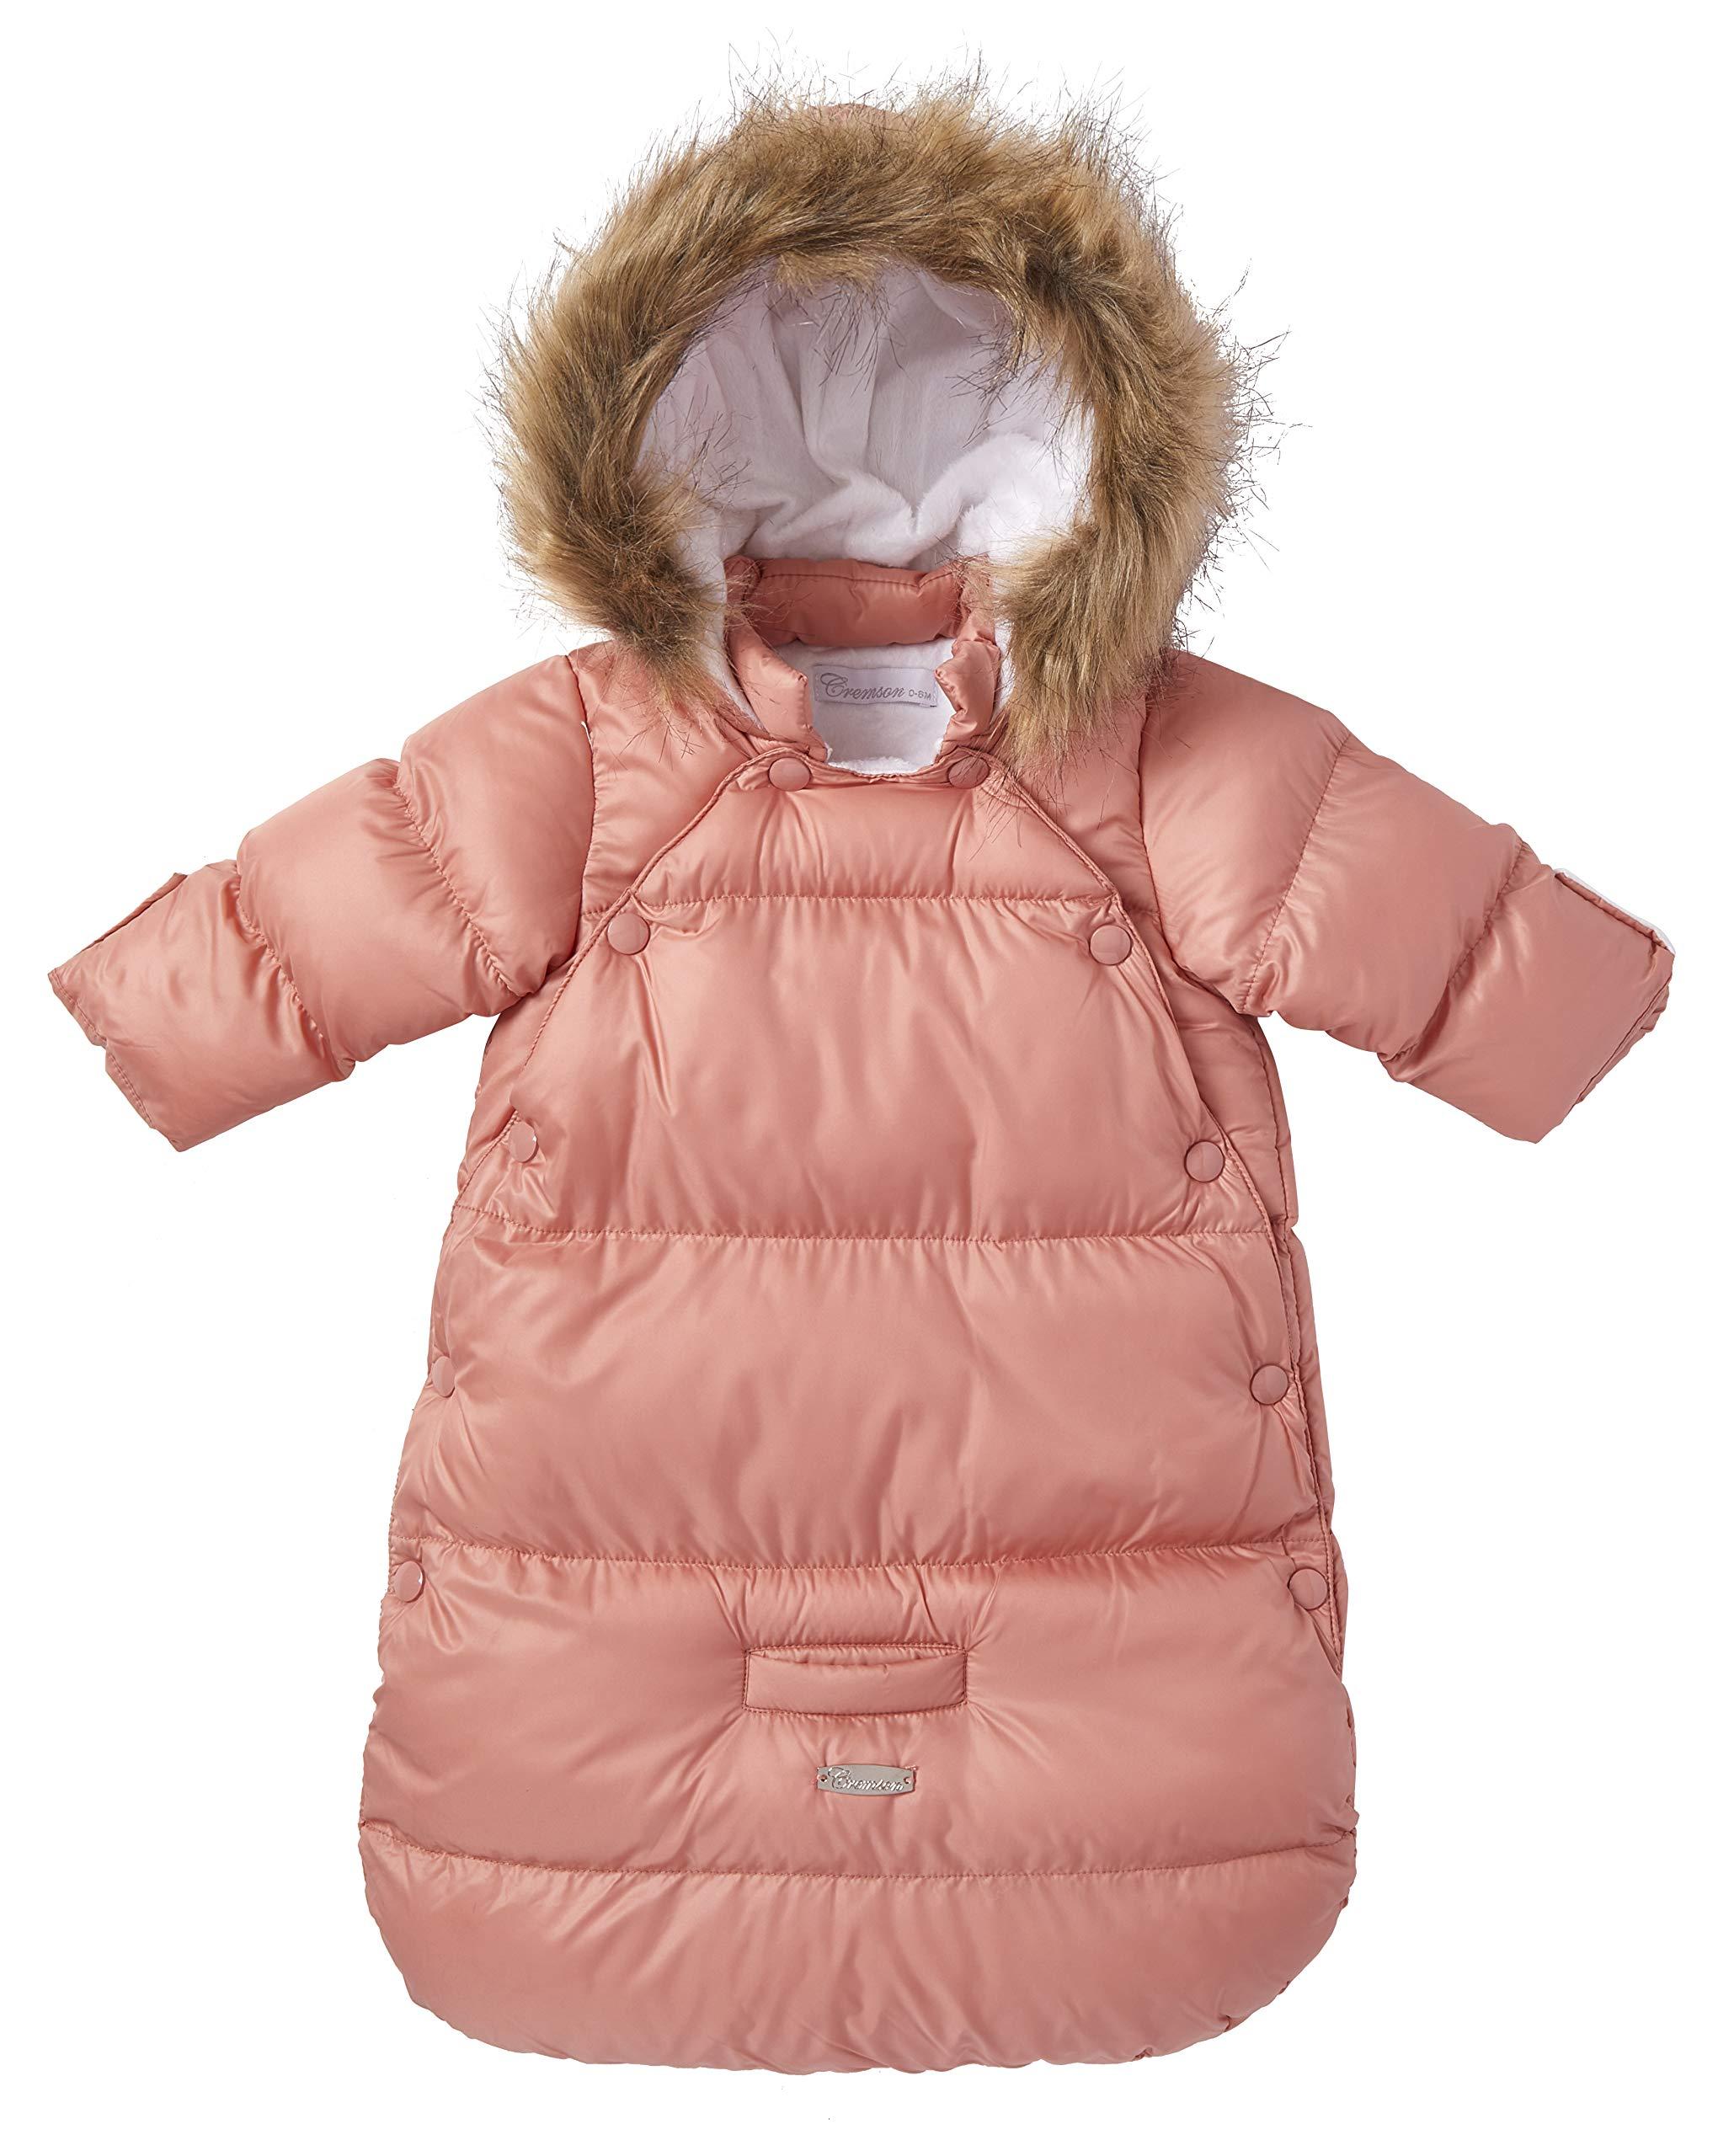 Cremson Girls Boys Newborn Infant Baby Puffer Carbag Pram Bag Snowsuit Bunting - Mauve Pink (Size 0/6 Months) by Cremson